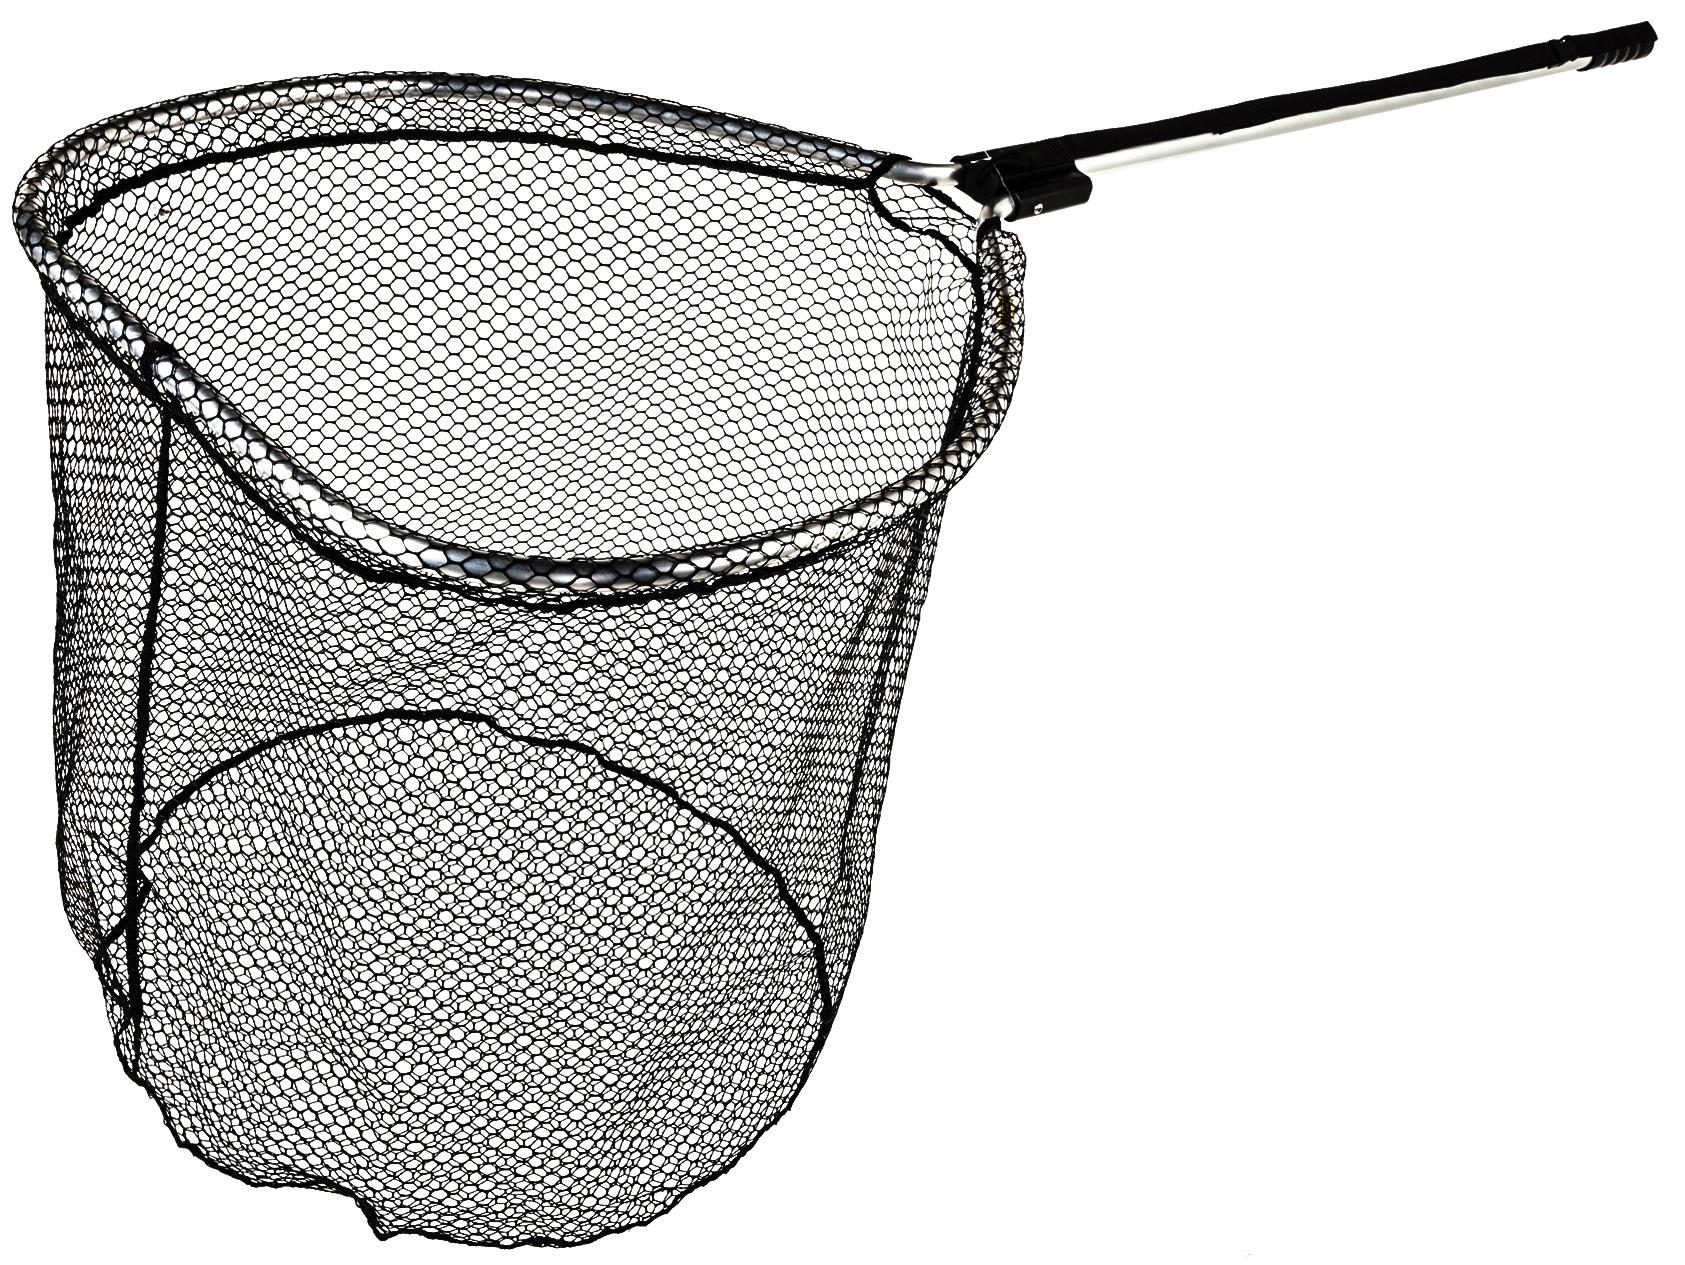 Mclean silver series seatrout specimen rubber net for Rubber fishing net